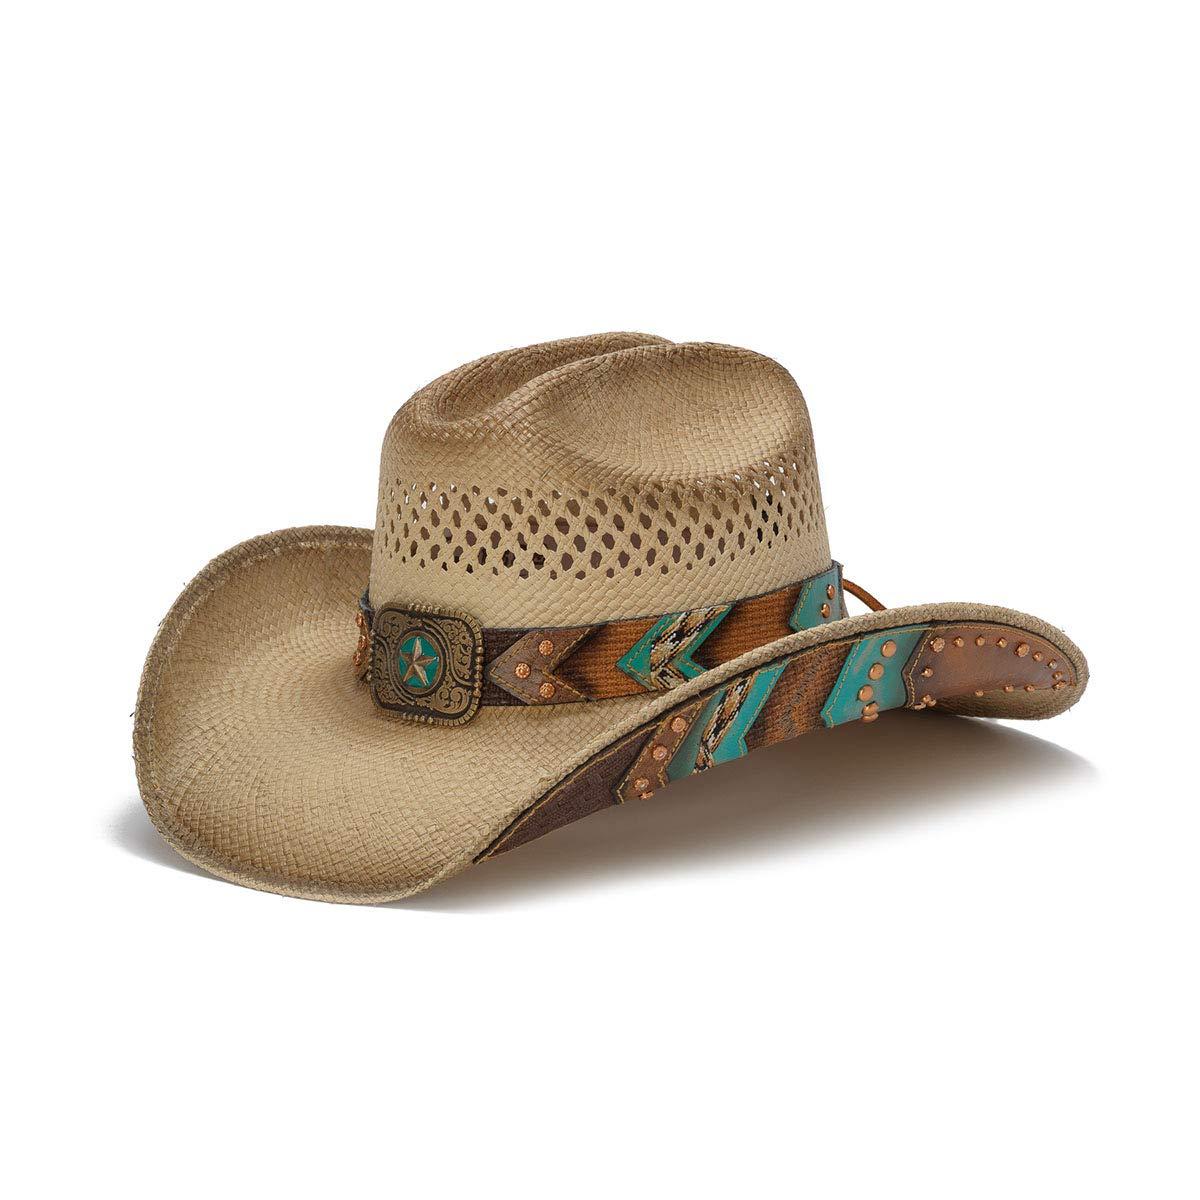 Stampede Hats Women's Chuck Wagon Lone Star Chevron Western Hat L Tea Stain